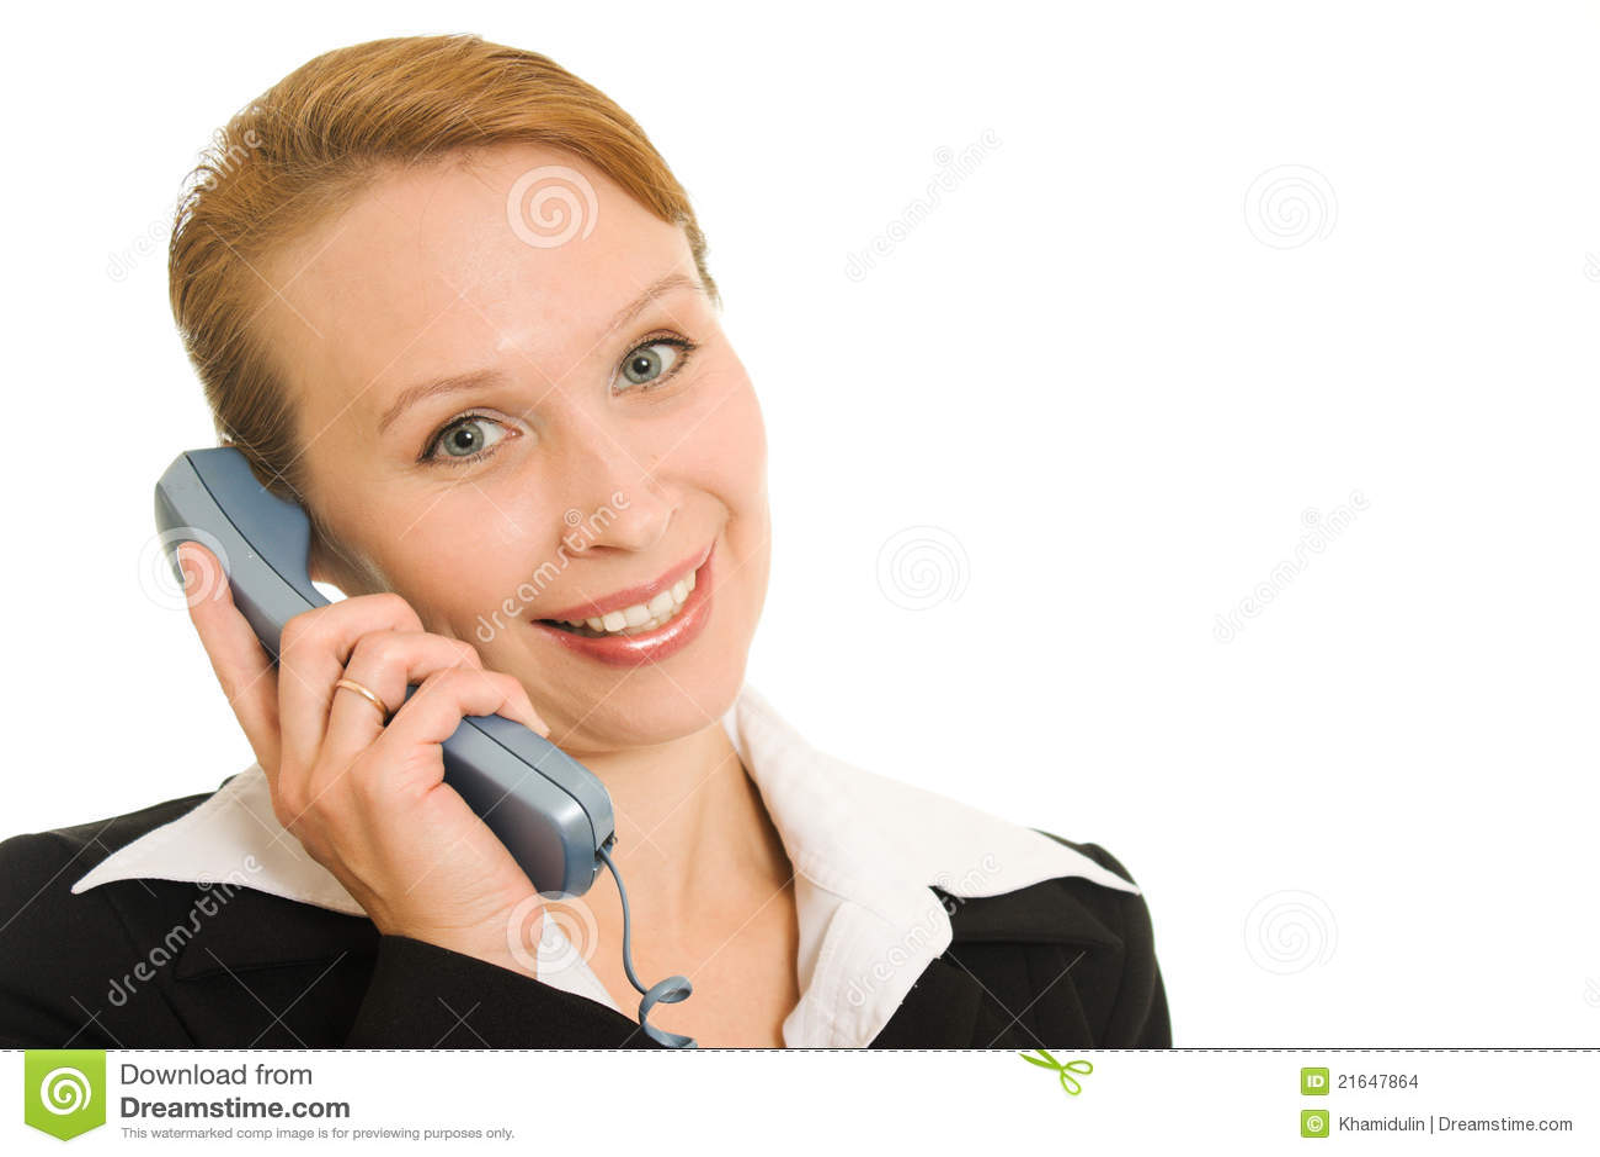 photos images woman talking phone